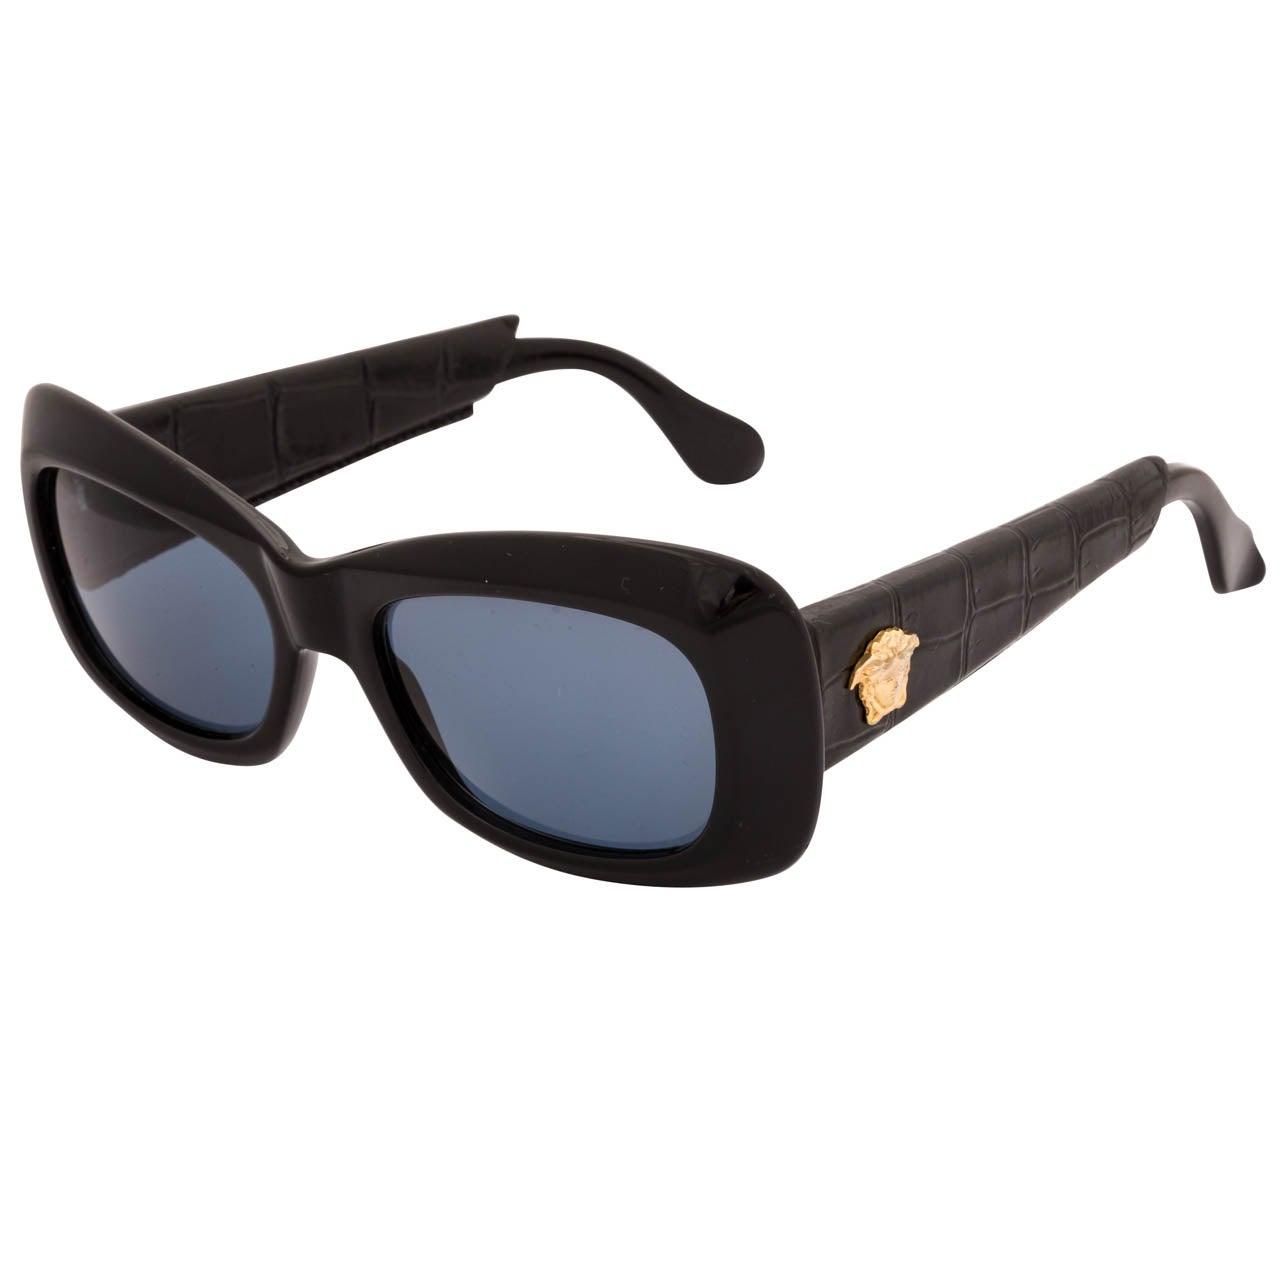 db1208a61f 20th Century Sunglasses - 1